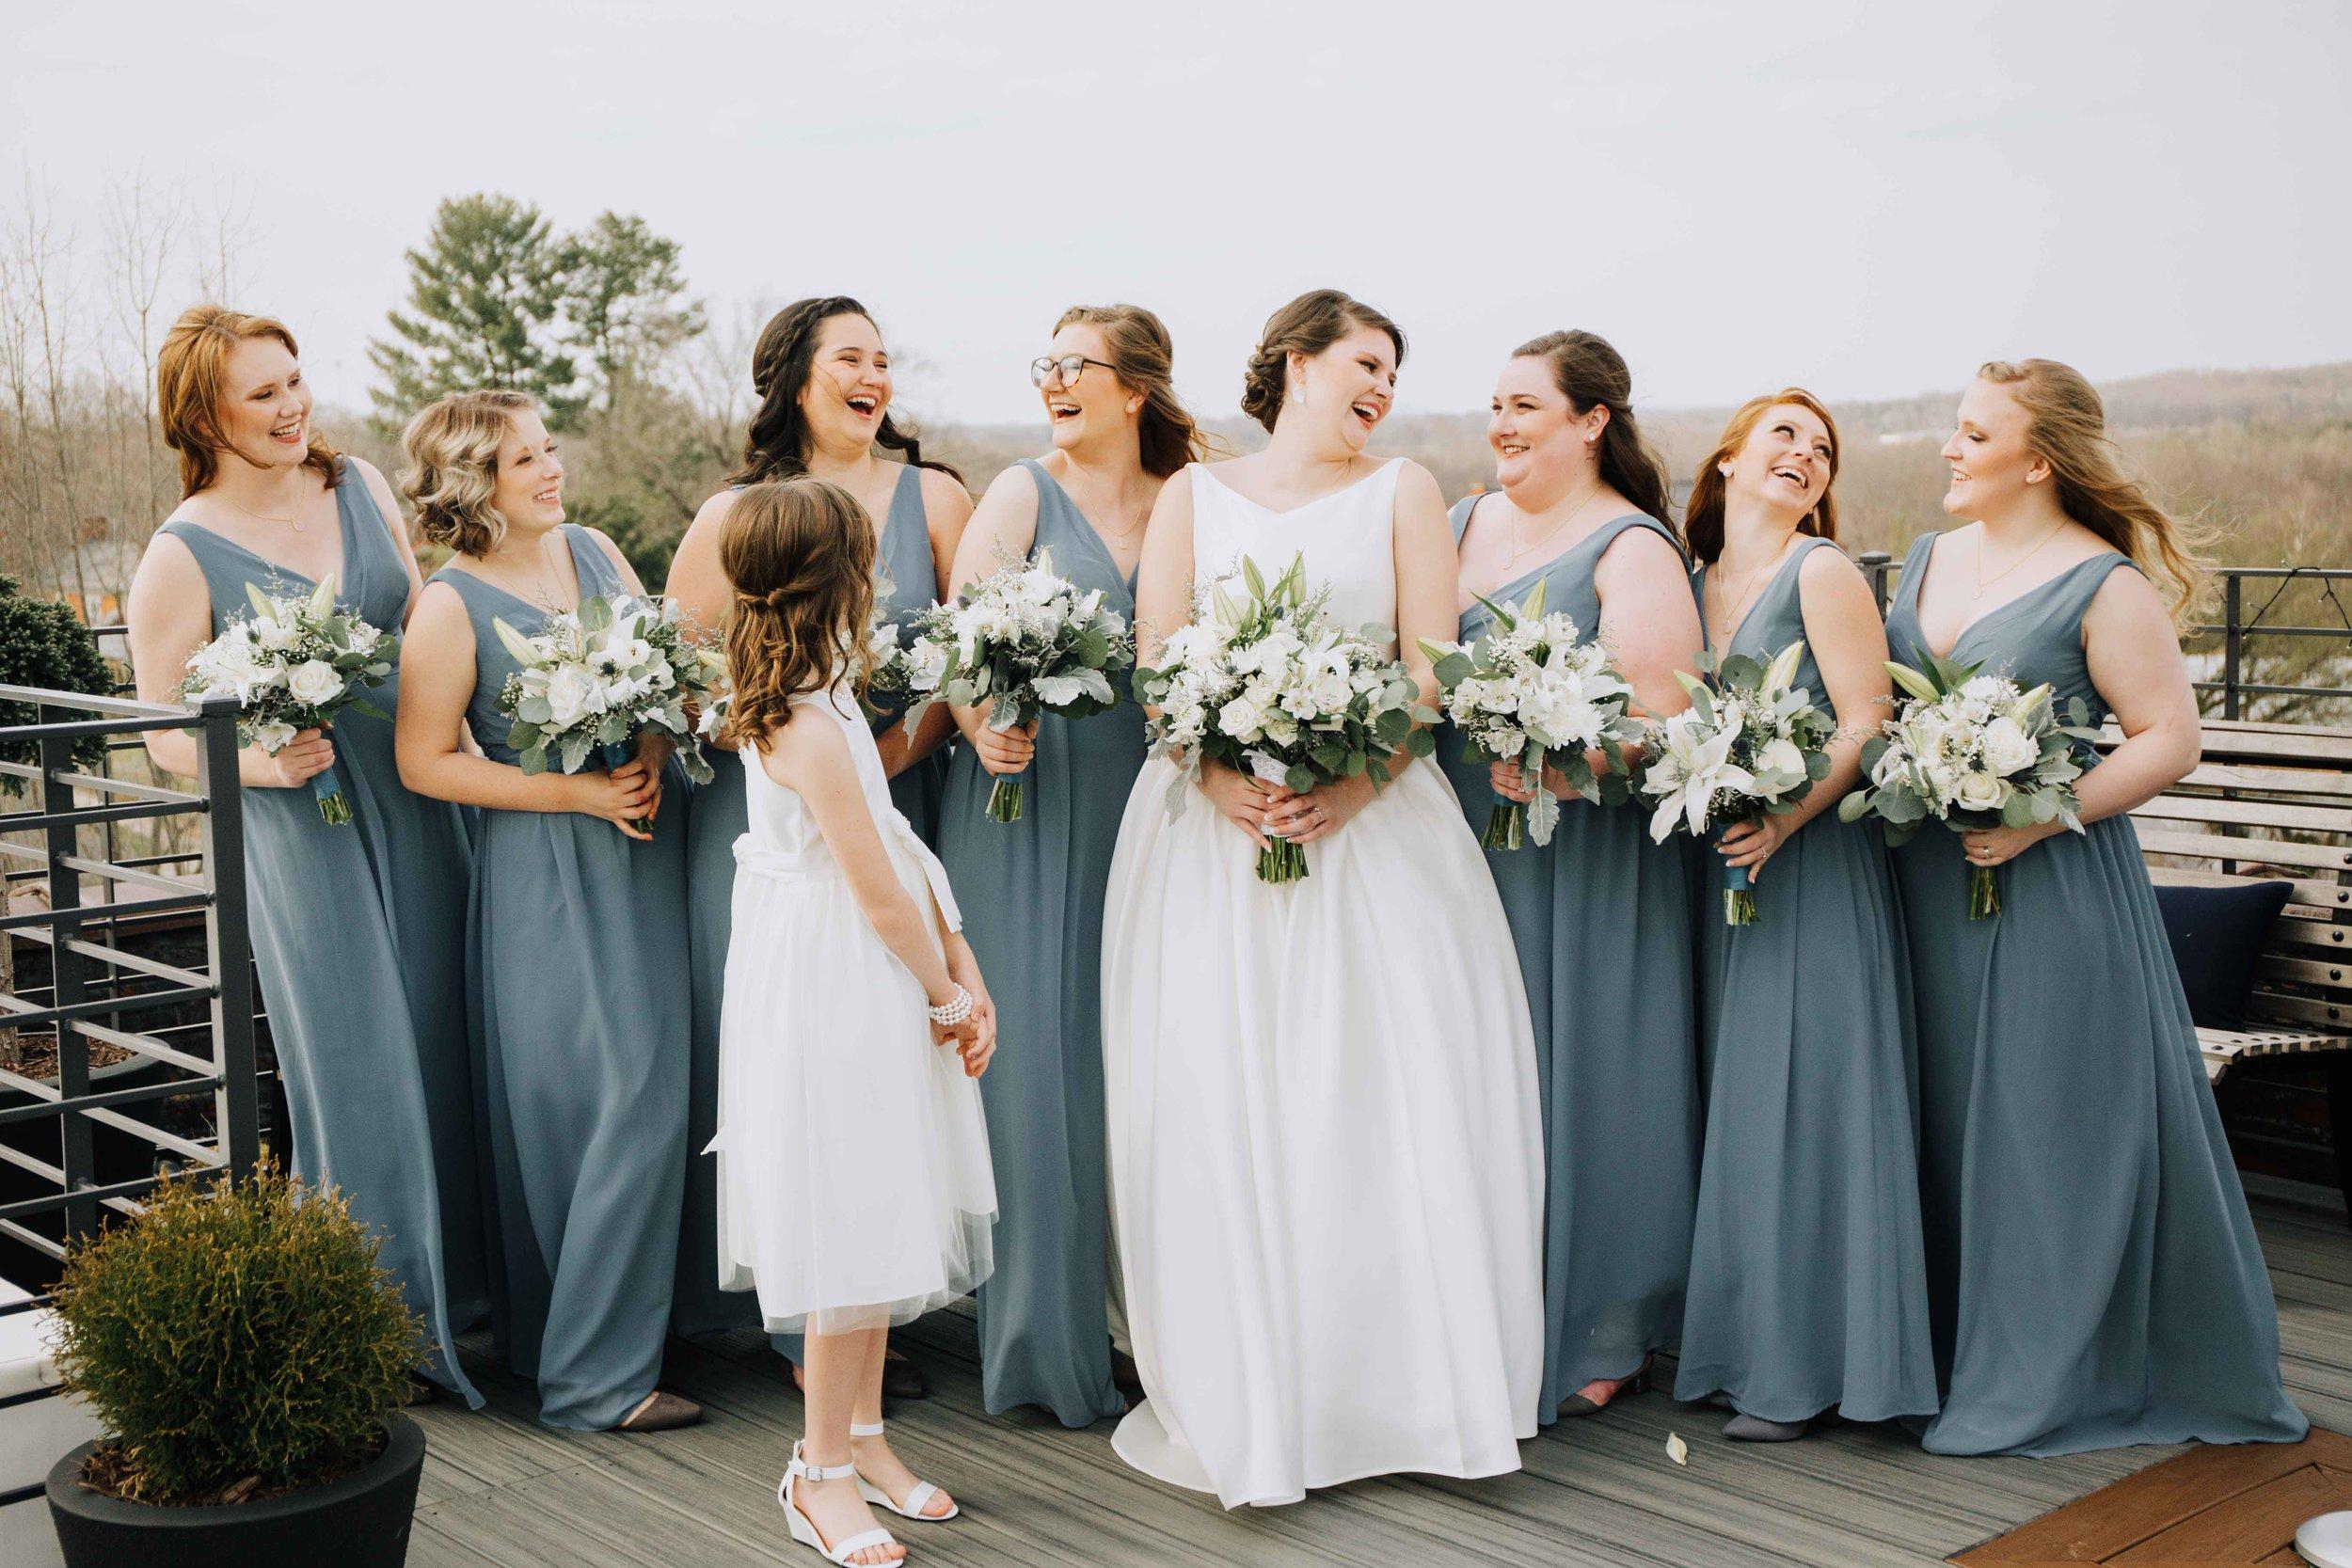 Farmville-Virginia-Wedding-Hotel-Weynoke-Downtown-Jacqueline-Waters-Photography-Detailed- (422).jpg